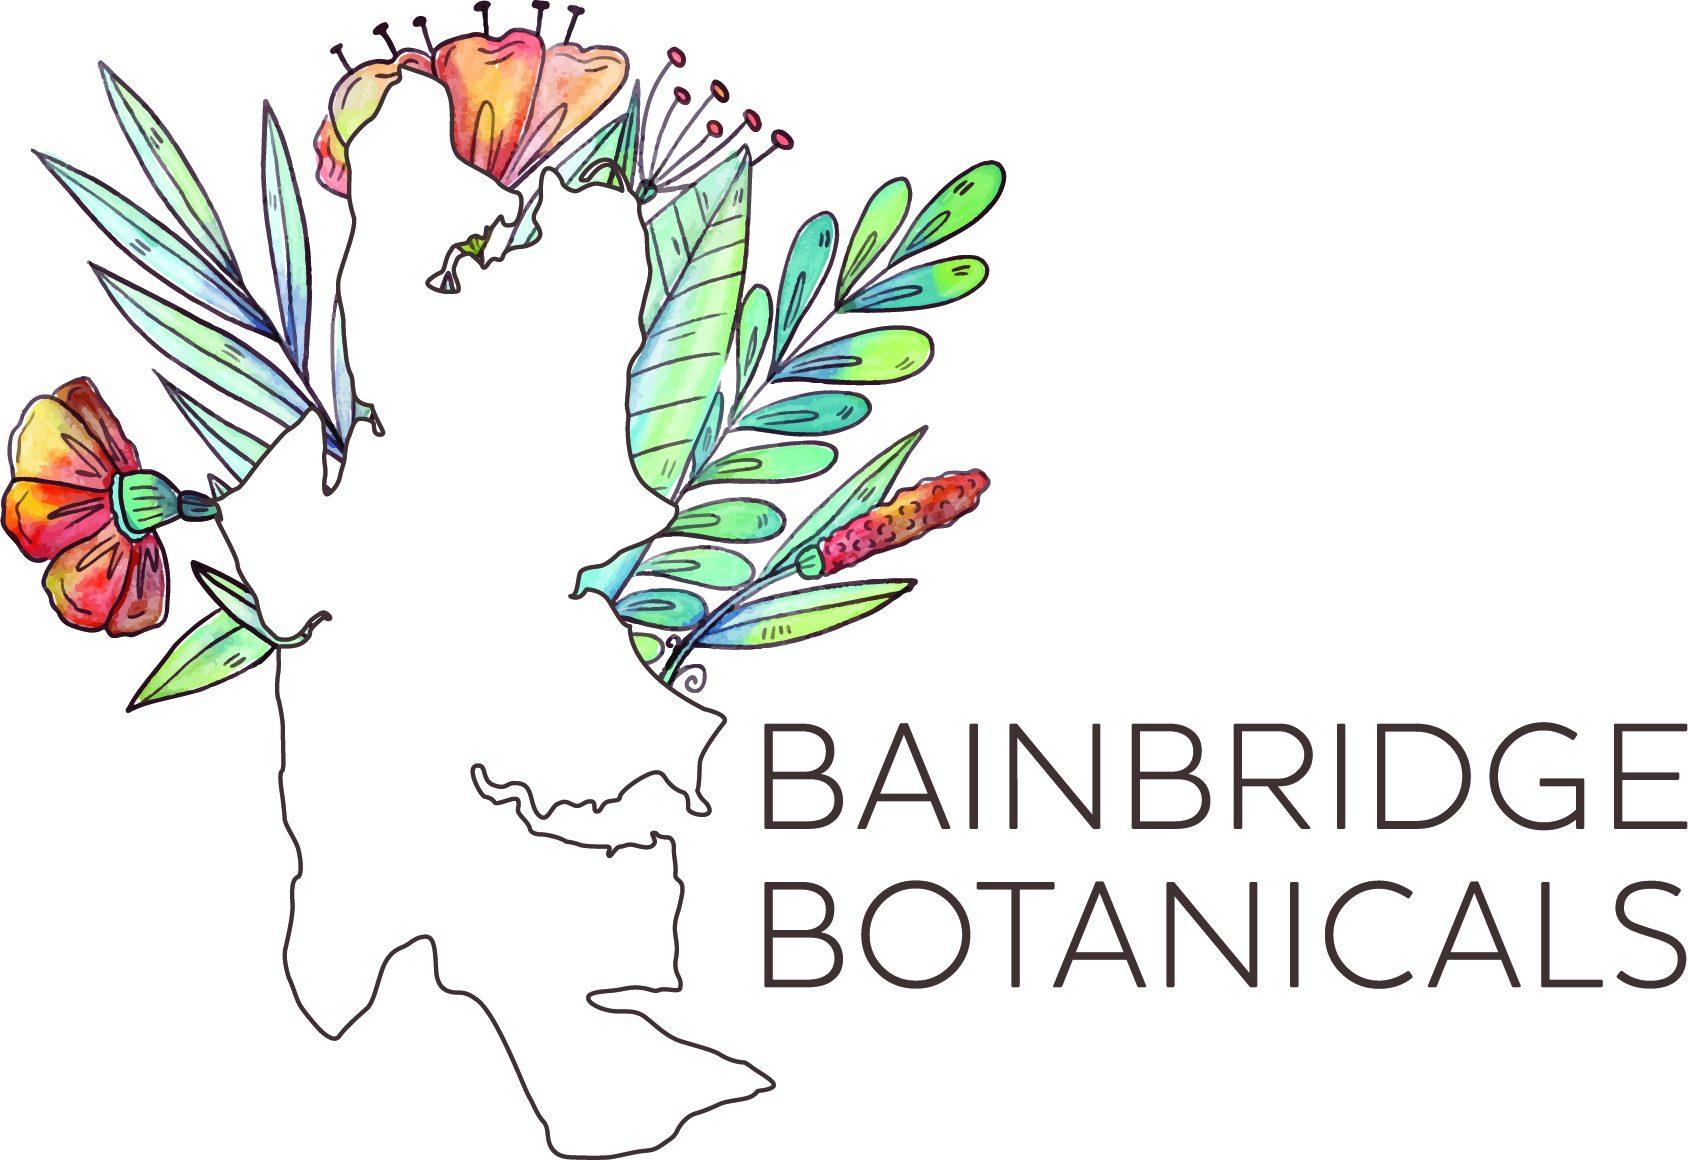 Bainbridge Botanicals LLC